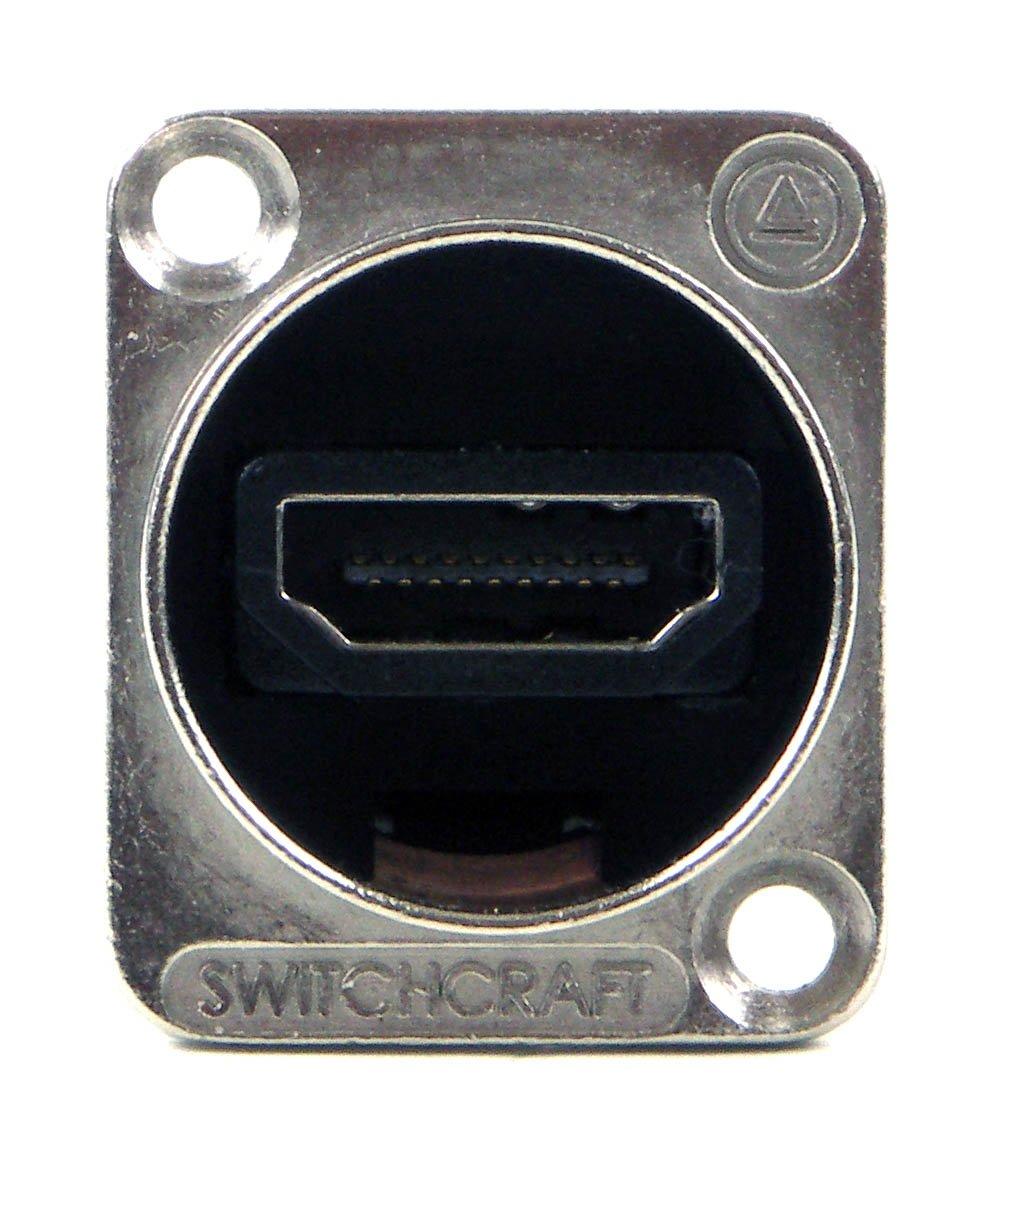 Switchcraft EHHDM12PKG HDMI Feedthru, Bagged with 4-40 Mounting Screws, Nickel Finish